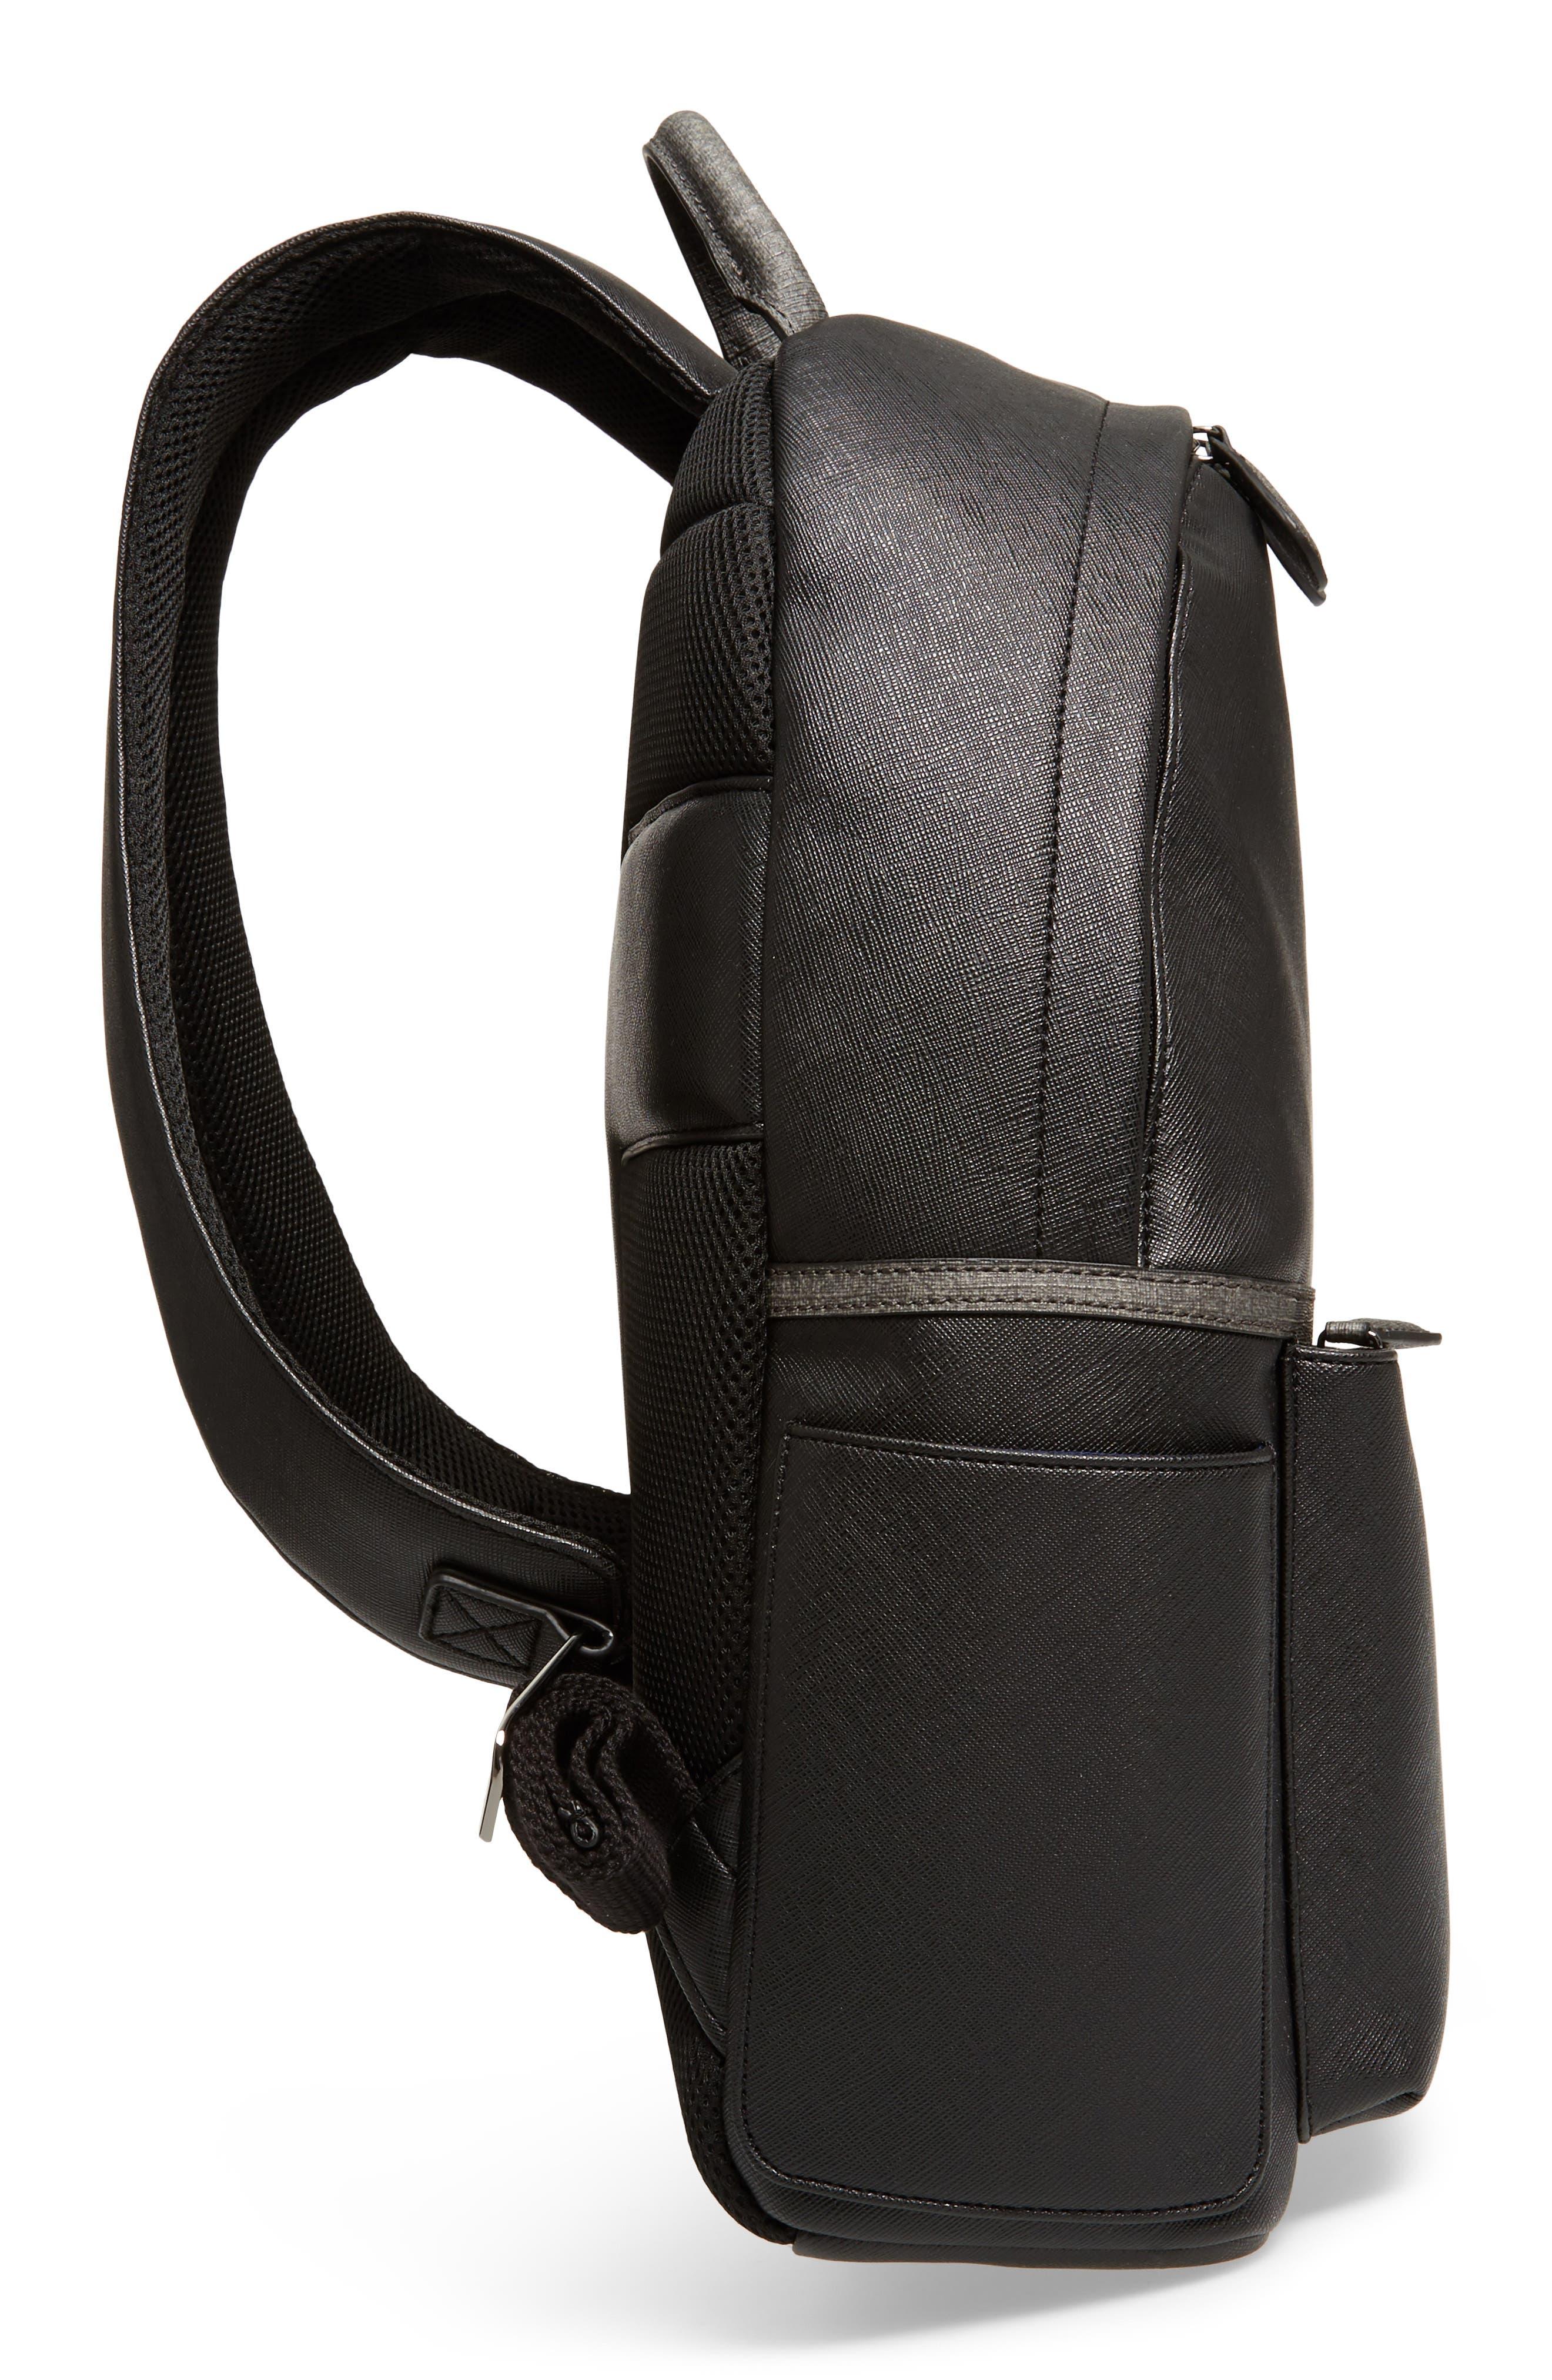 TED BAKER Fangs Backpack in Black